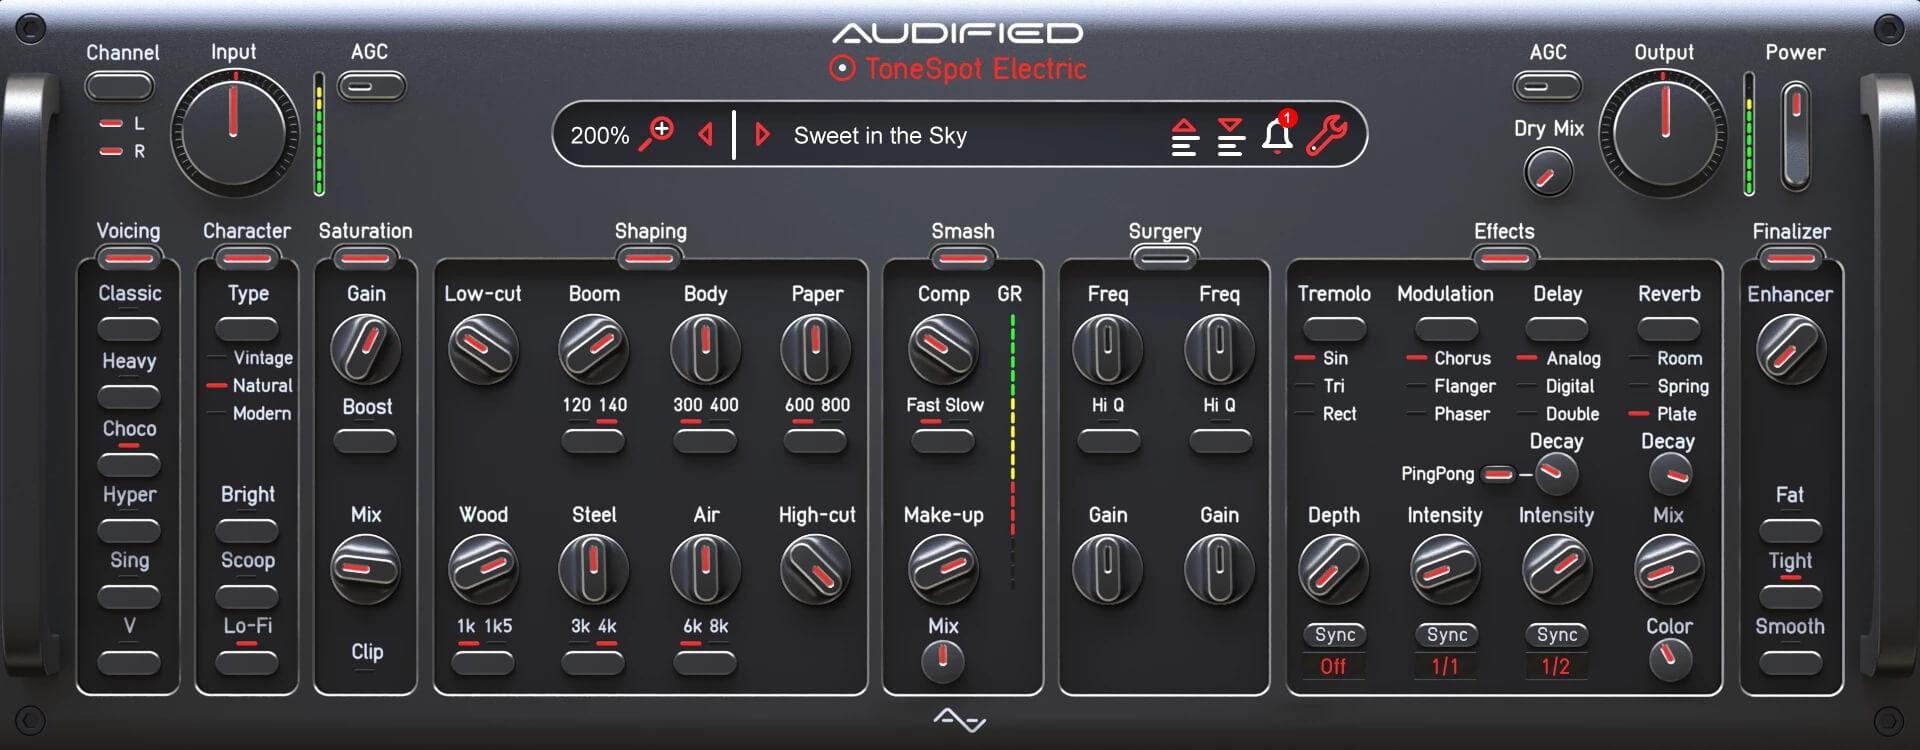 audified releases tonespot electric pro multi fx effect plugin. Black Bedroom Furniture Sets. Home Design Ideas